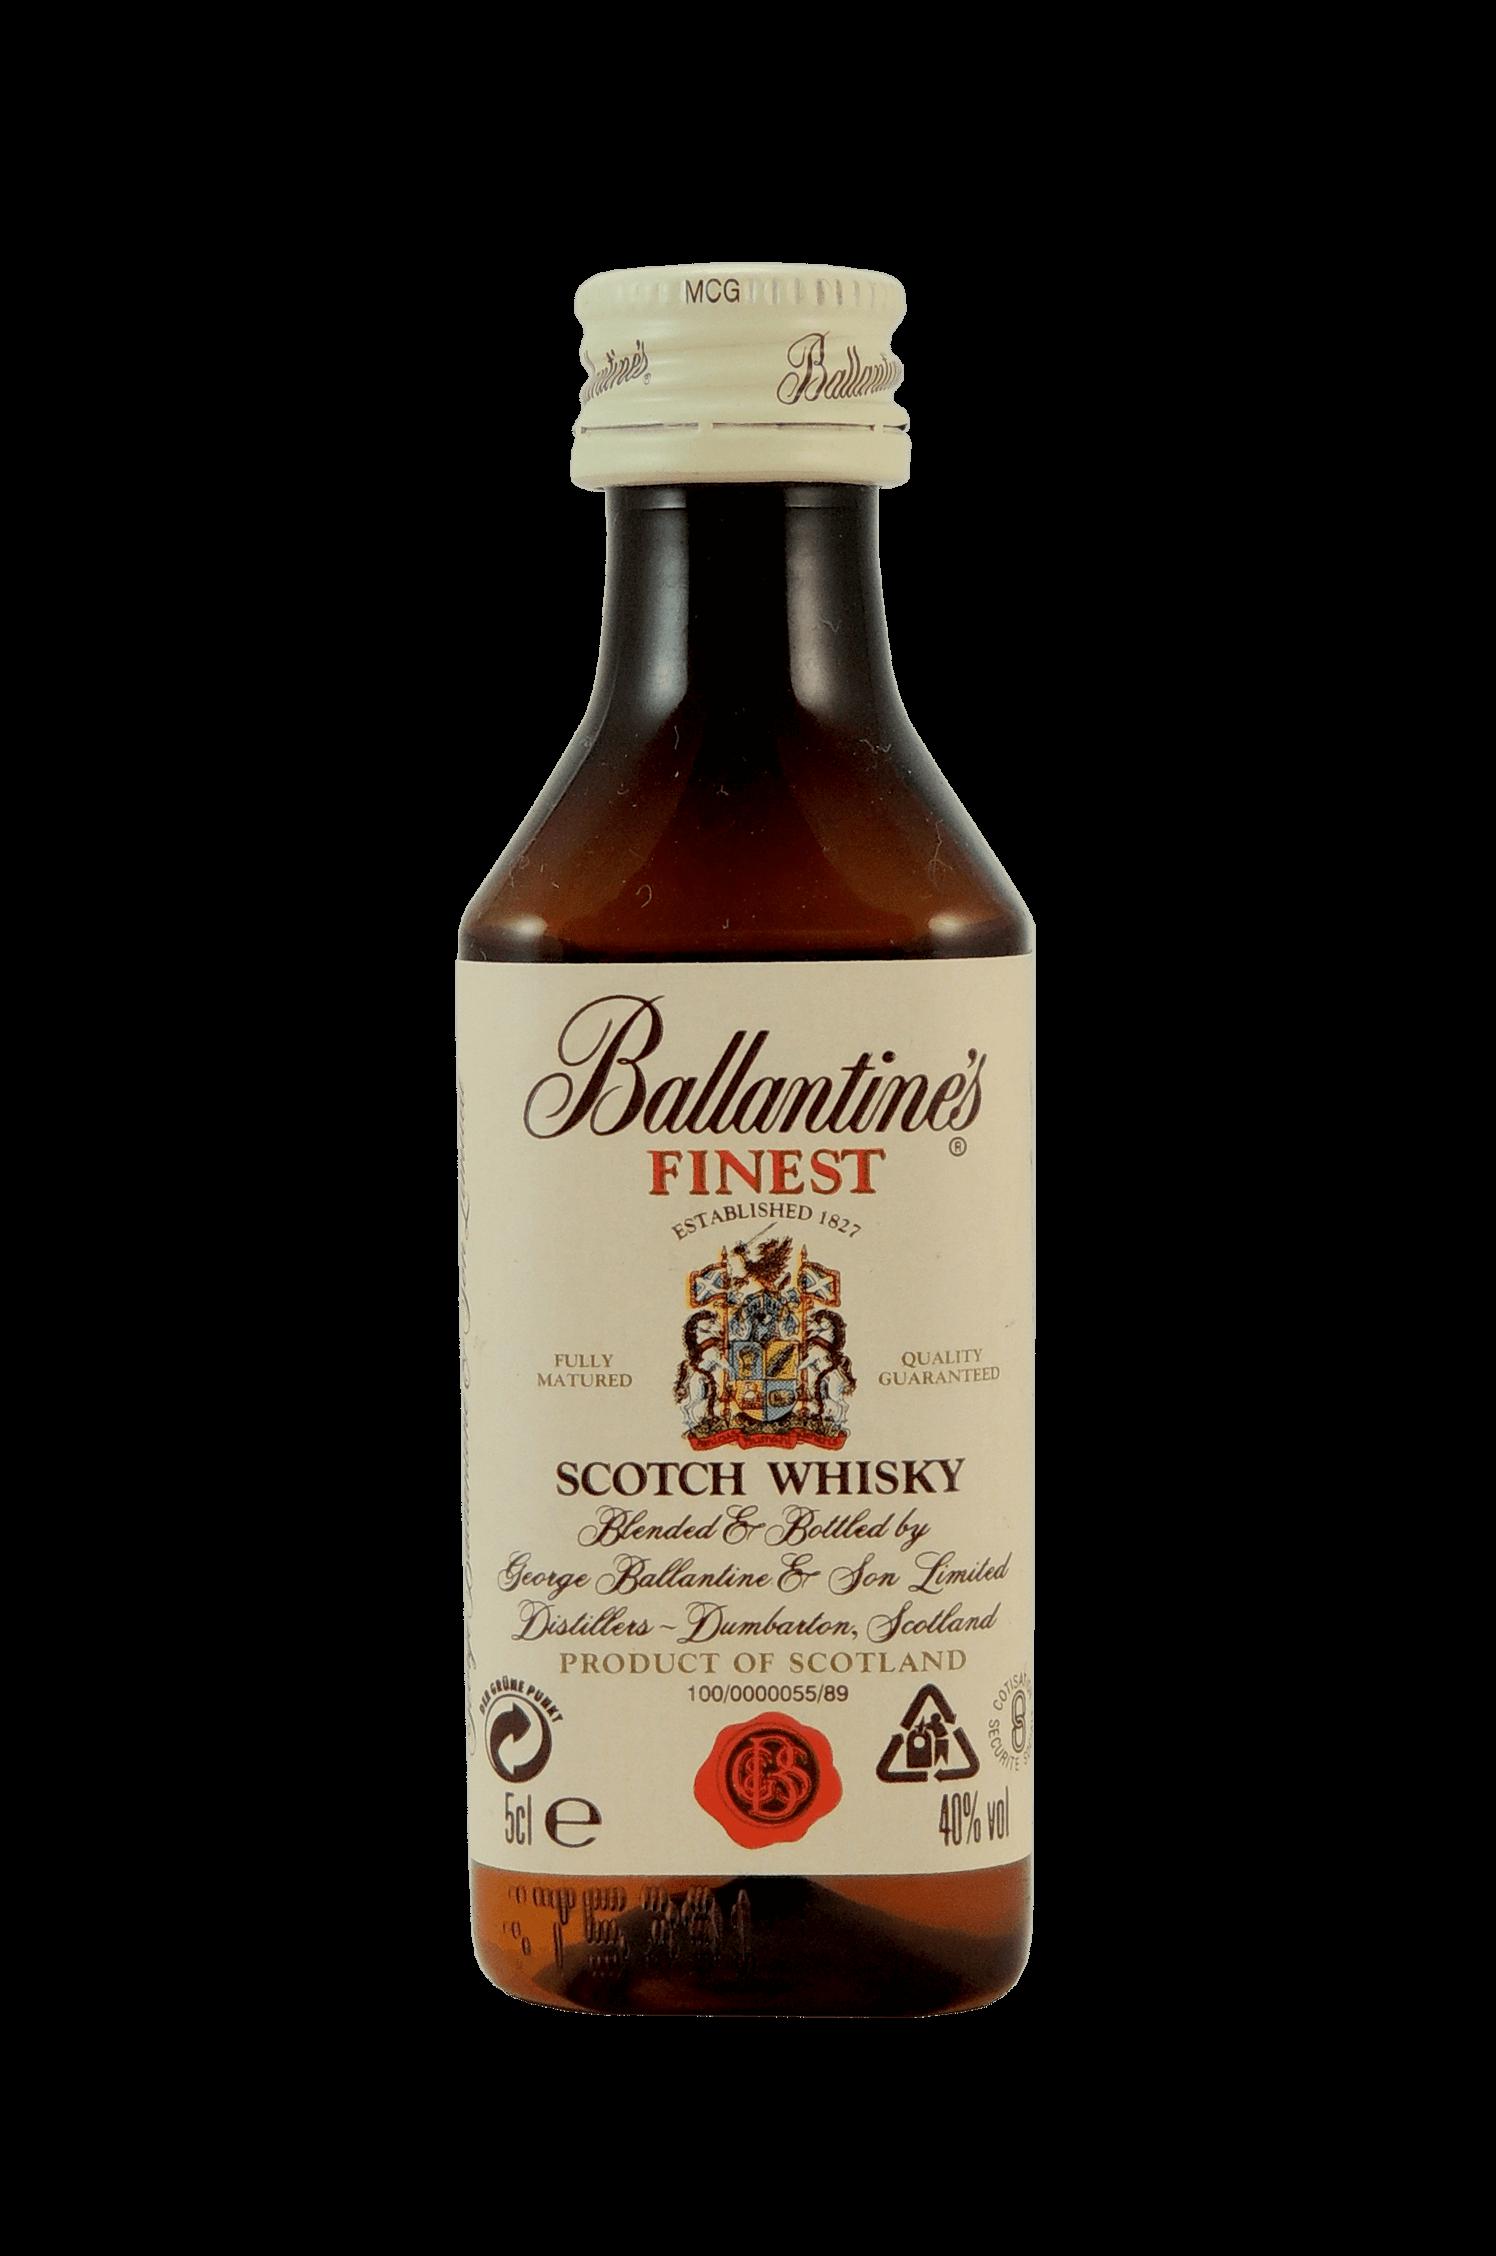 Ballantines Finest Scotch Whisky